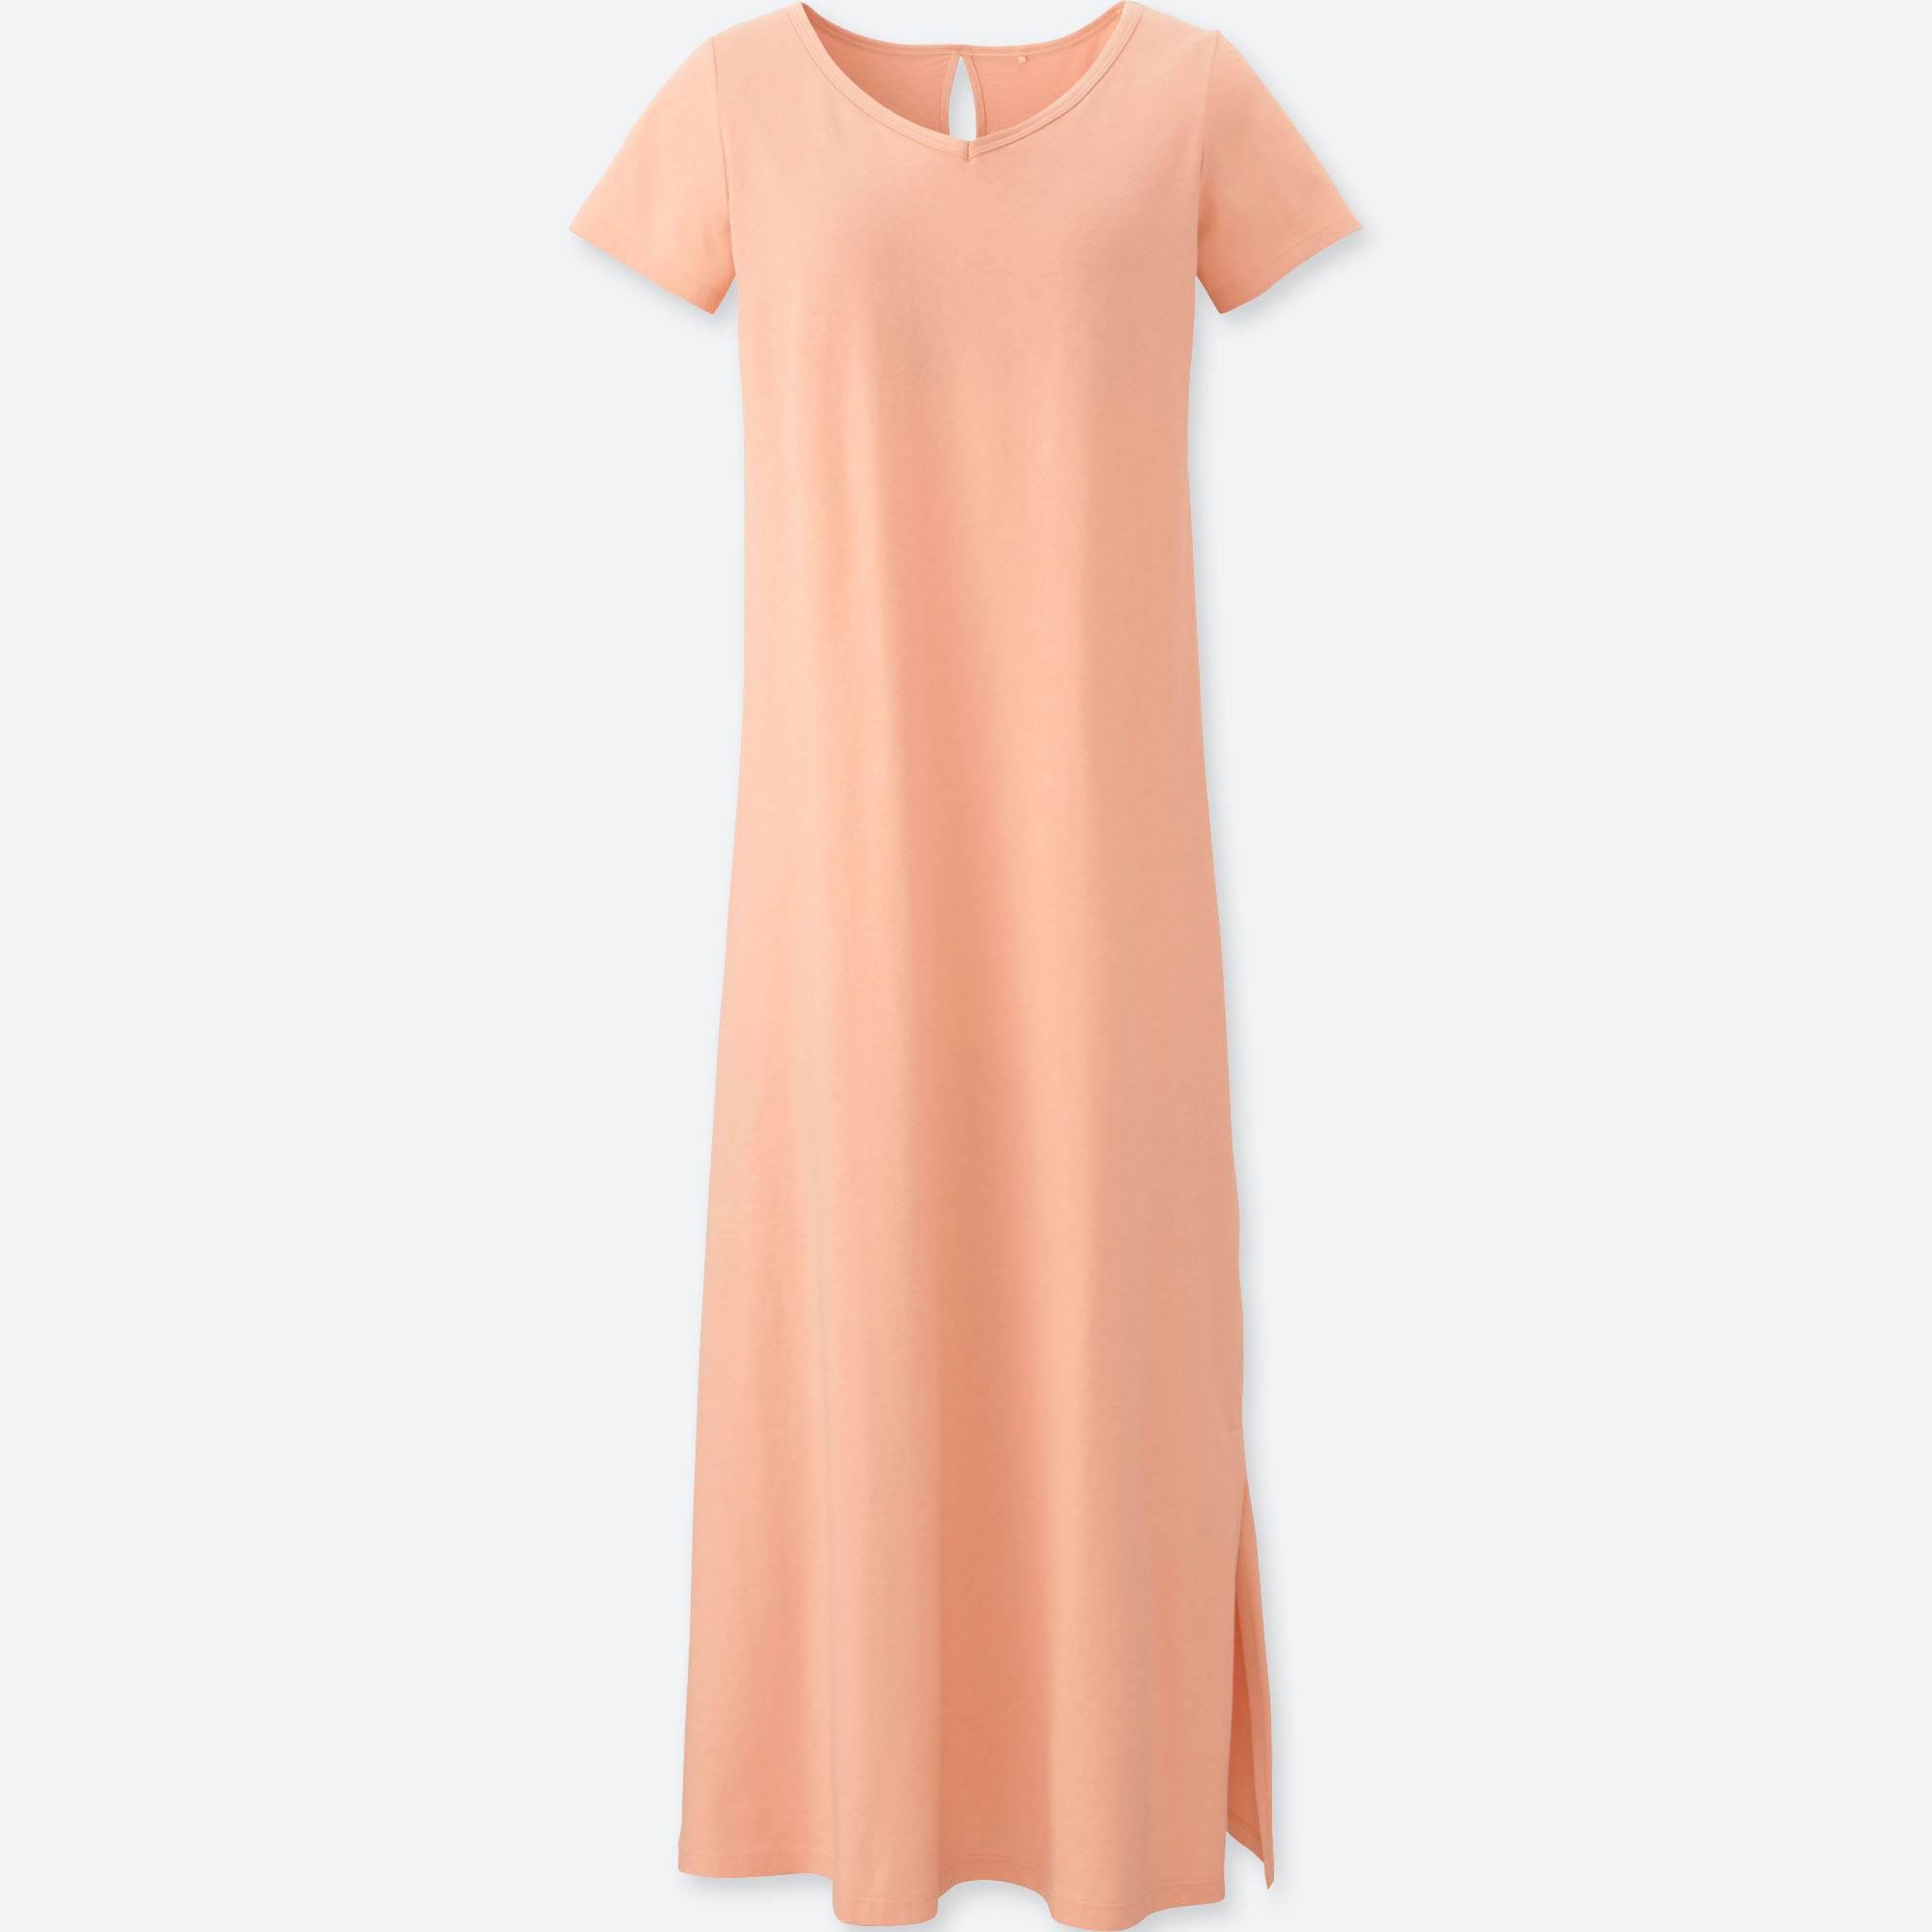 c12c29abec Lyst - Uniqlo Women Short-sleeve Easy Bra Dress